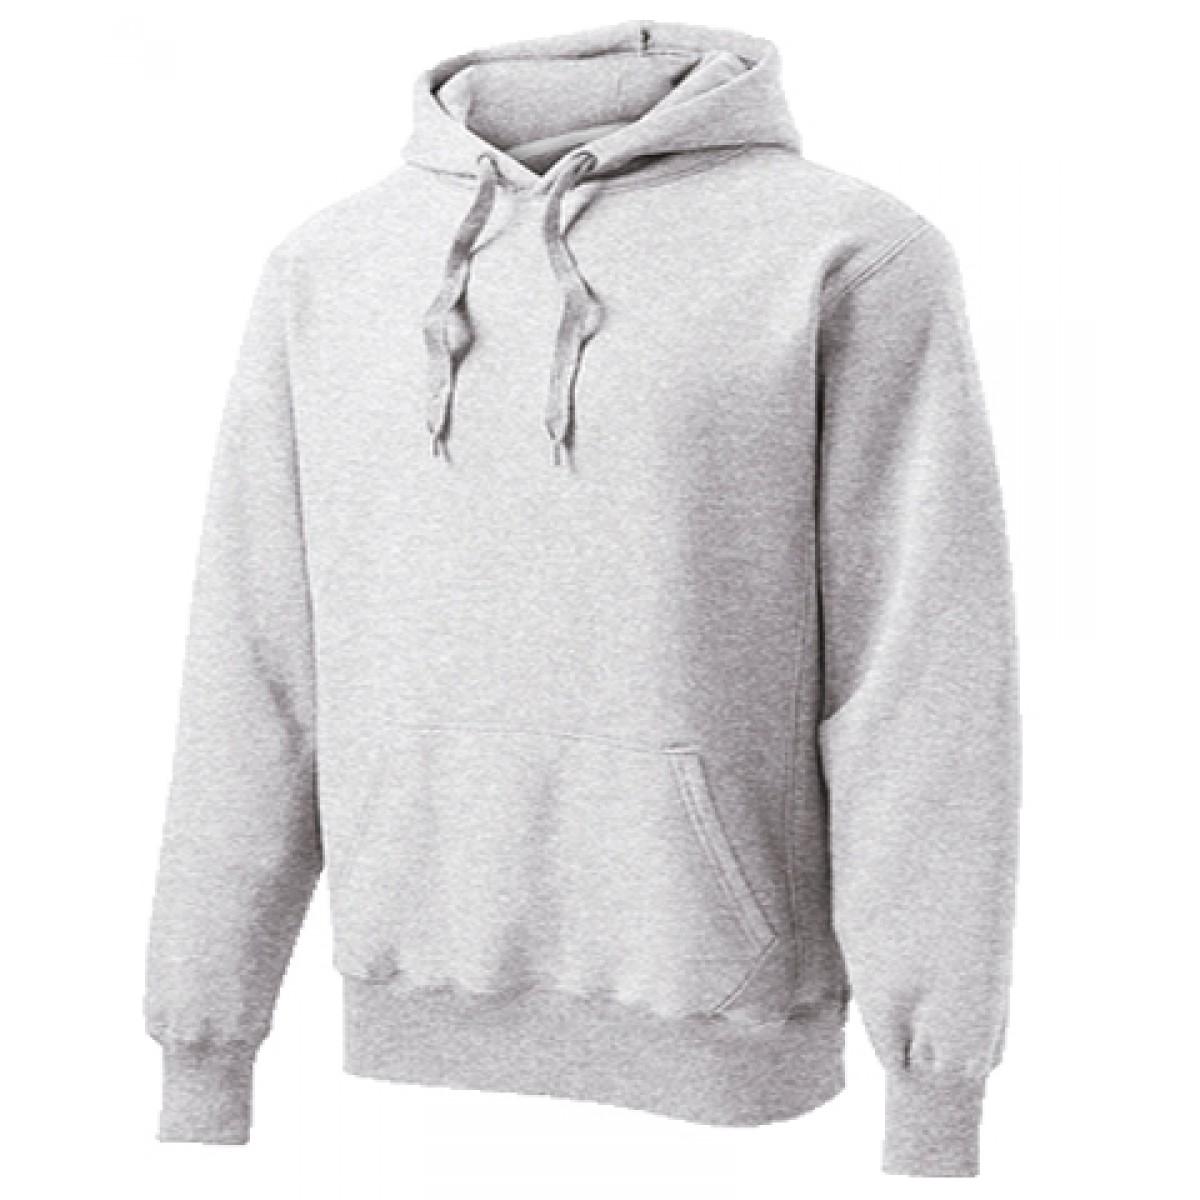 Hooded Sweatshirt 50/50 Heavy Blend Gray-Gray -M